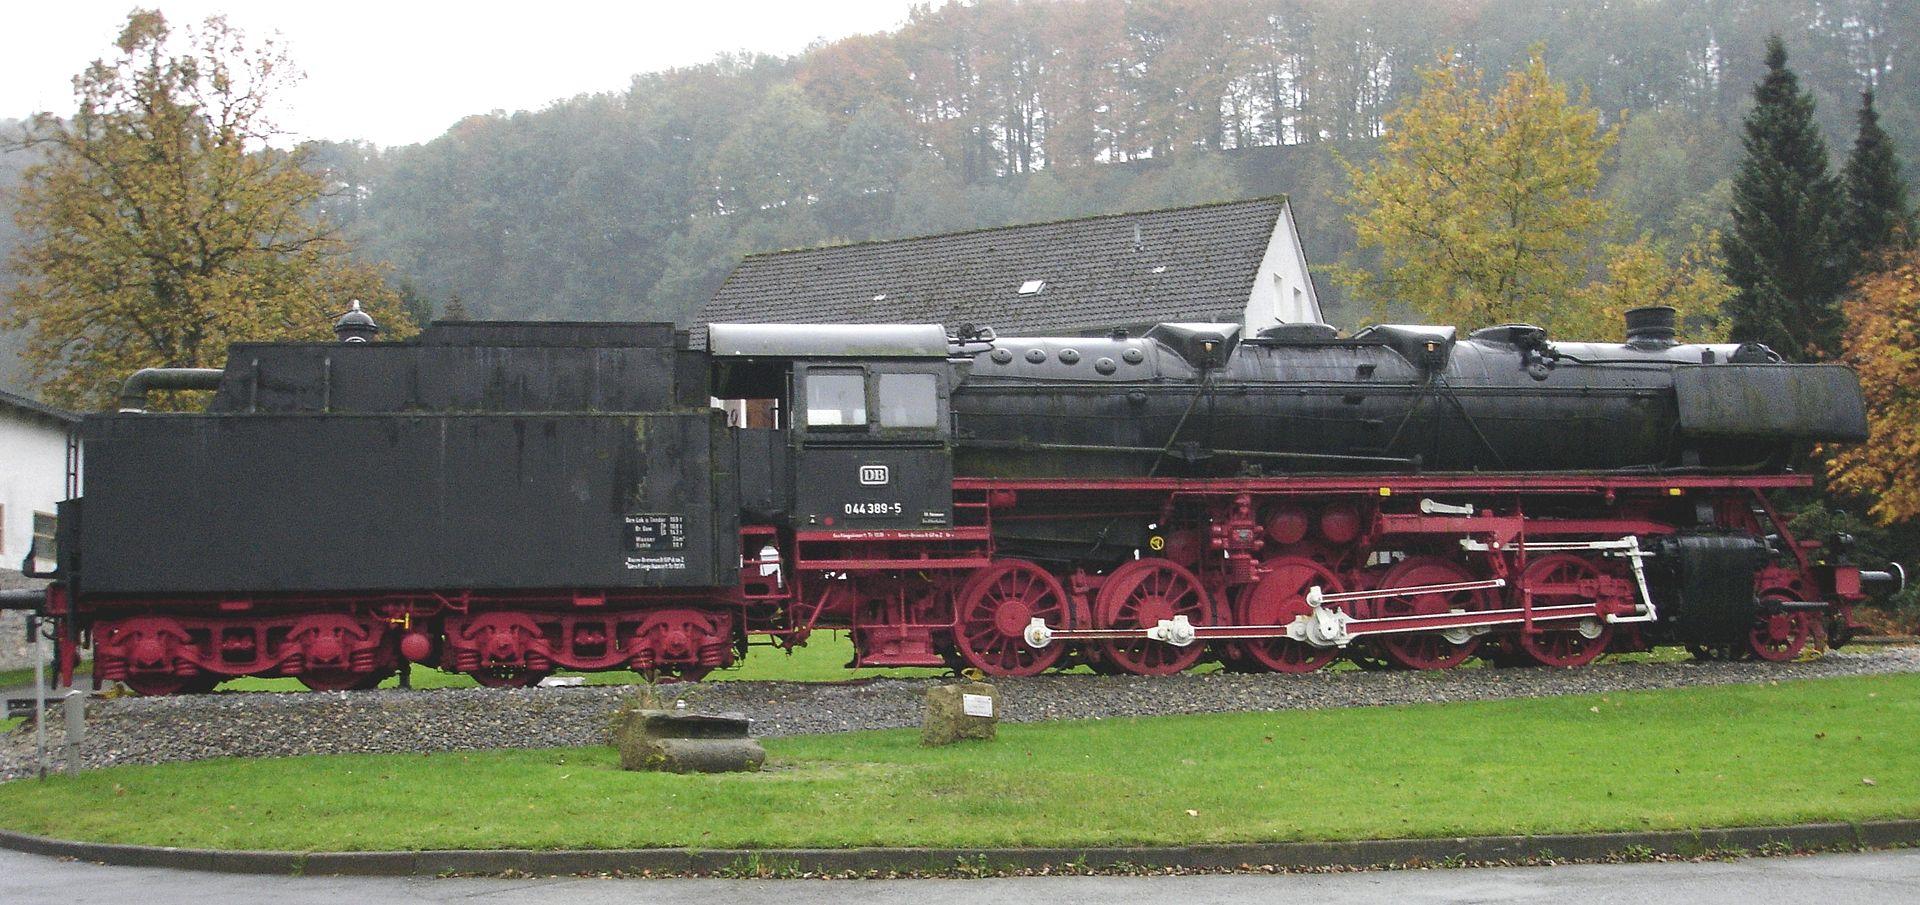 Bild Museumsdampflokomotive Altenbeken